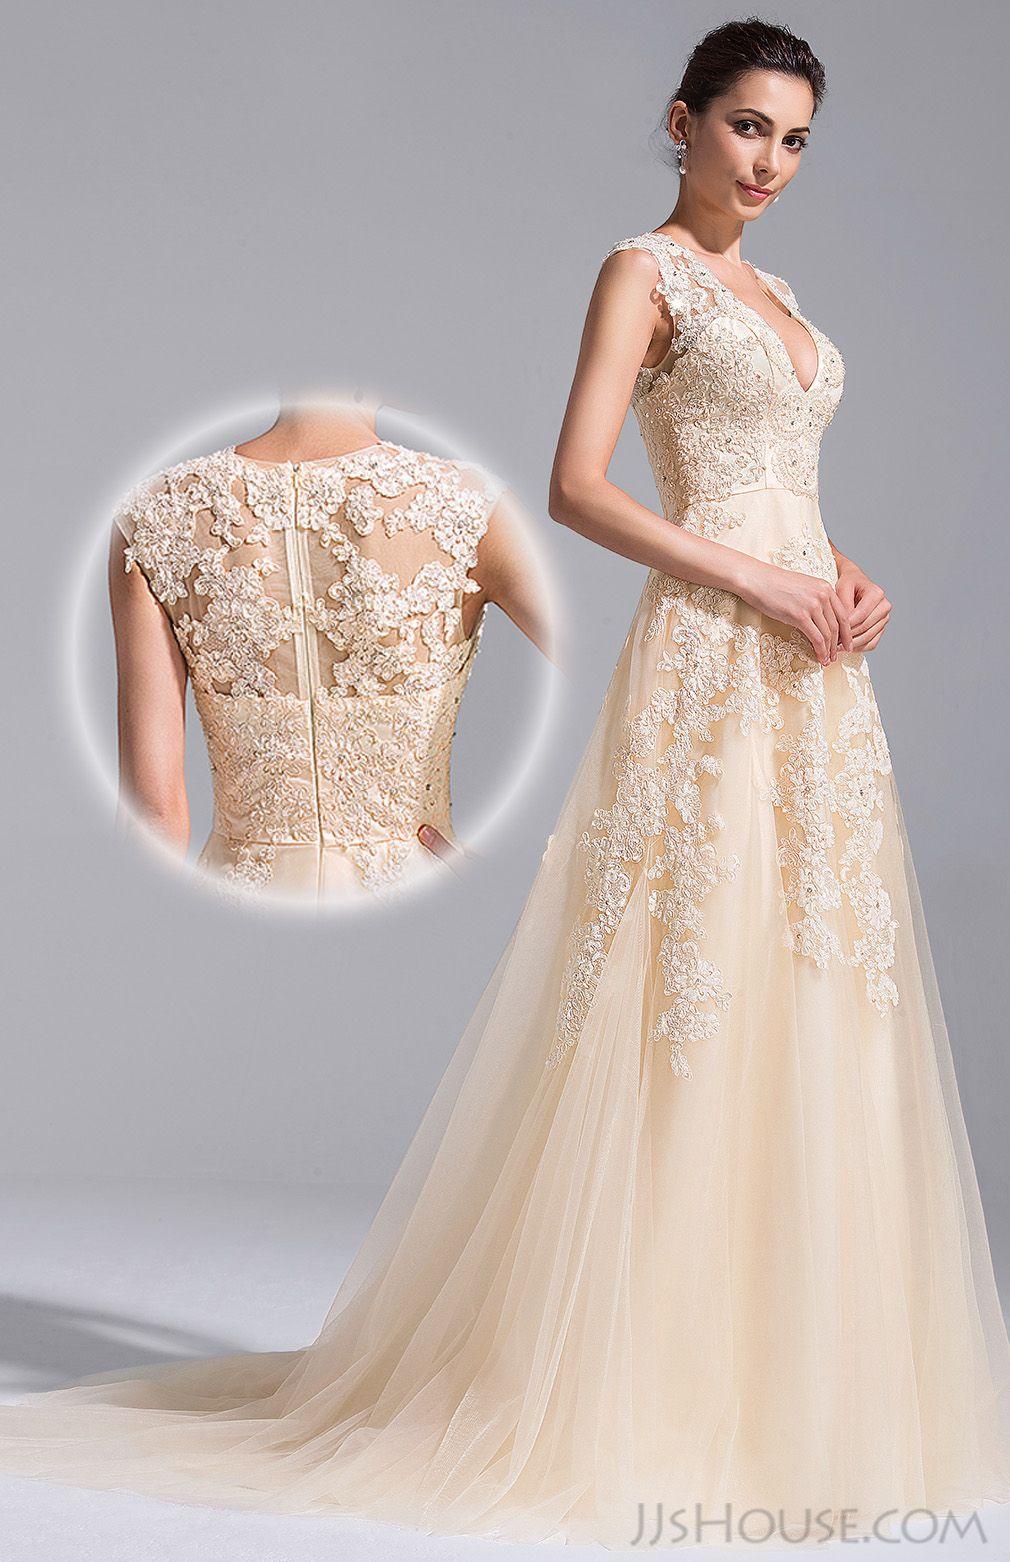 Alineprincess vneck court train tulle wedding dress with beading